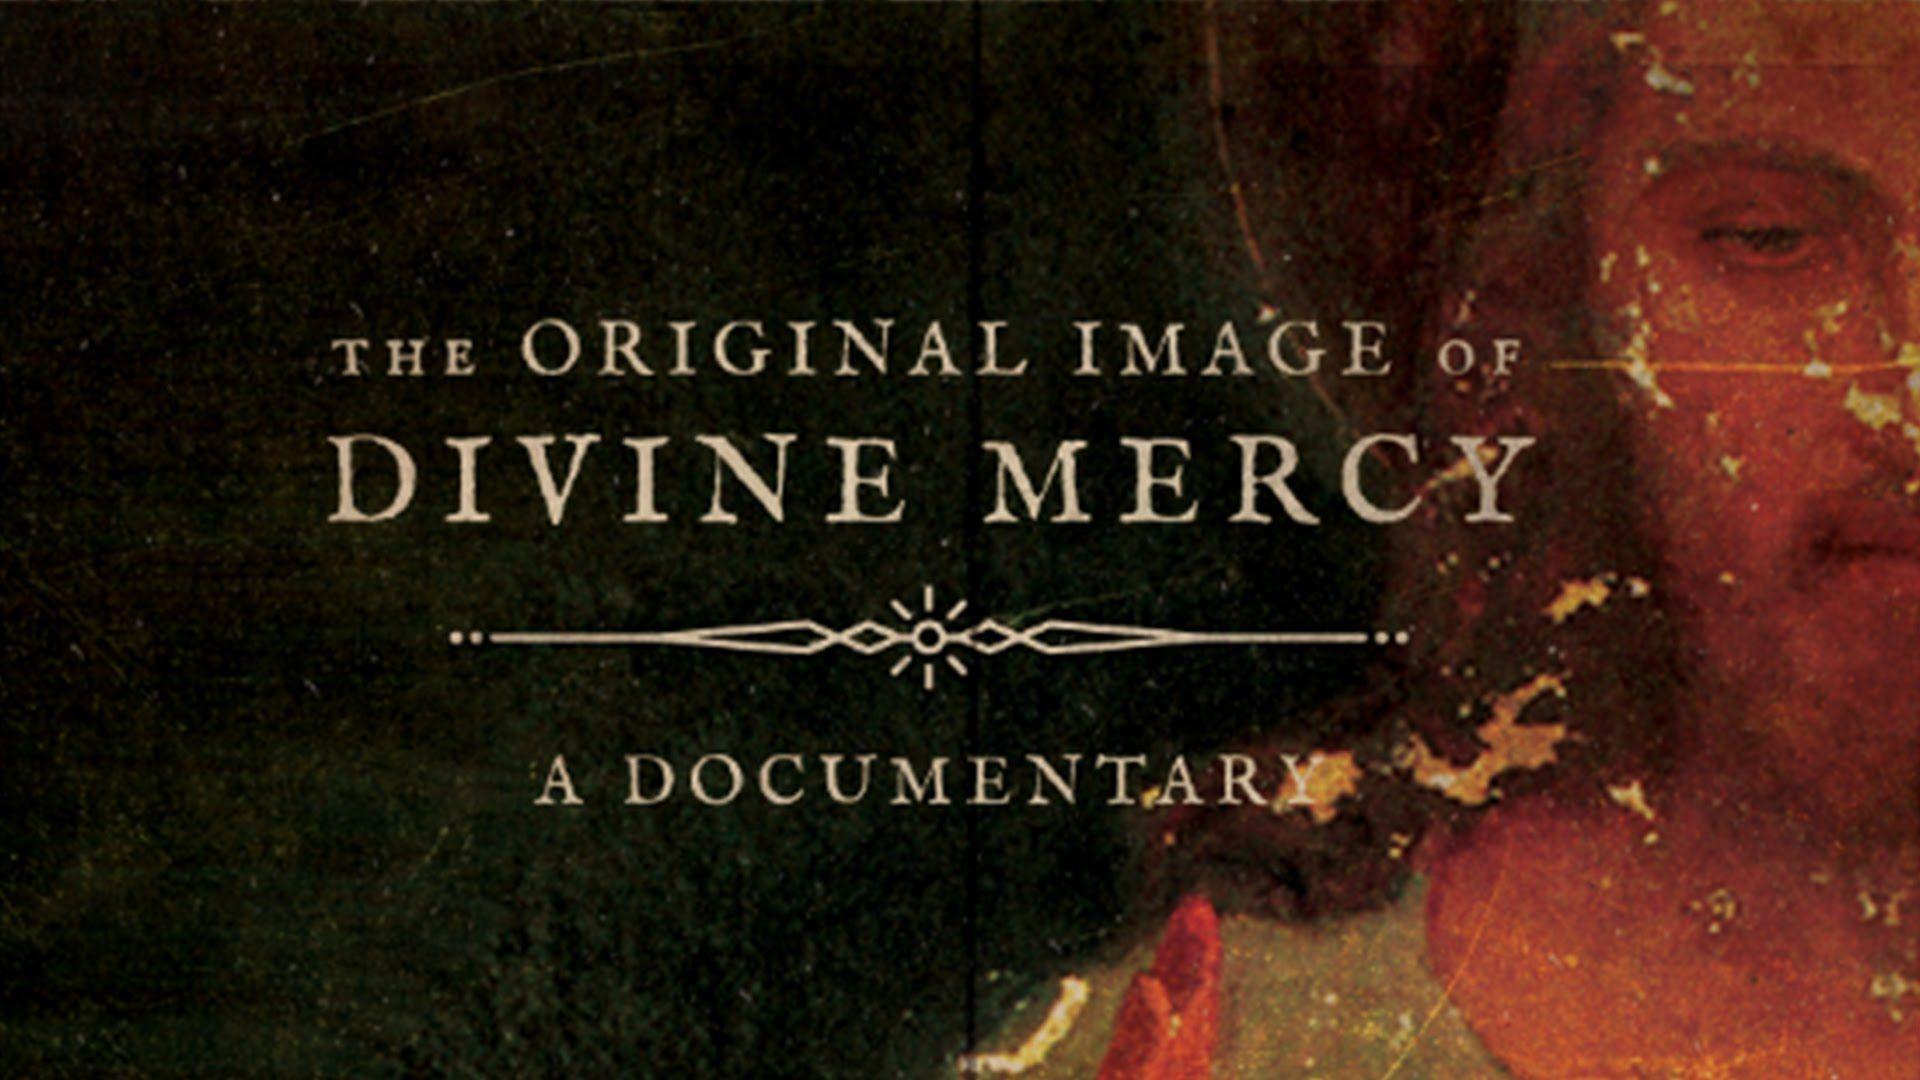 The Original Image of Divine Mercy Movie Trailer